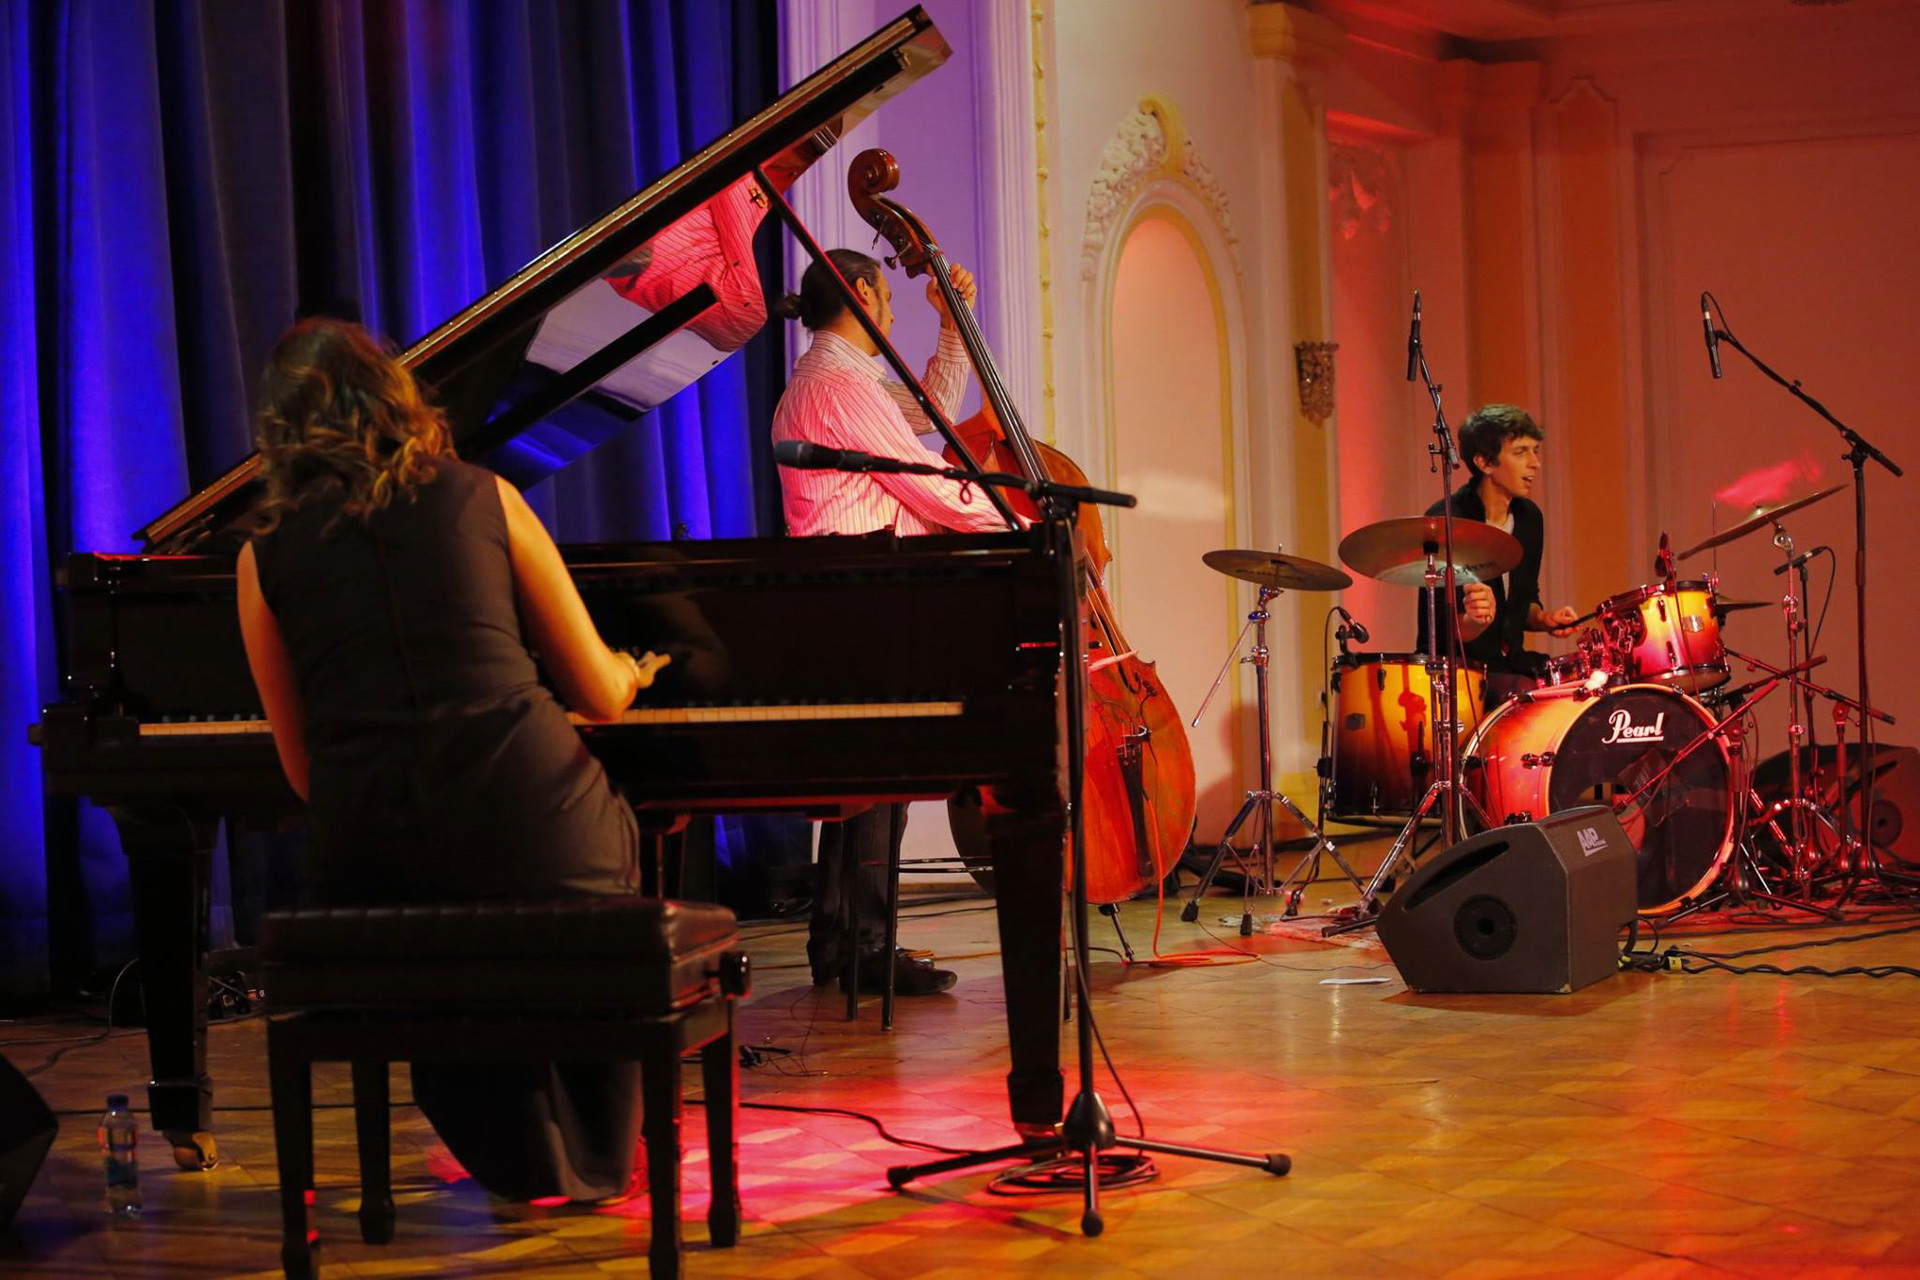 Intime jazz festival, Banski dvor, Banja Luka 2018.